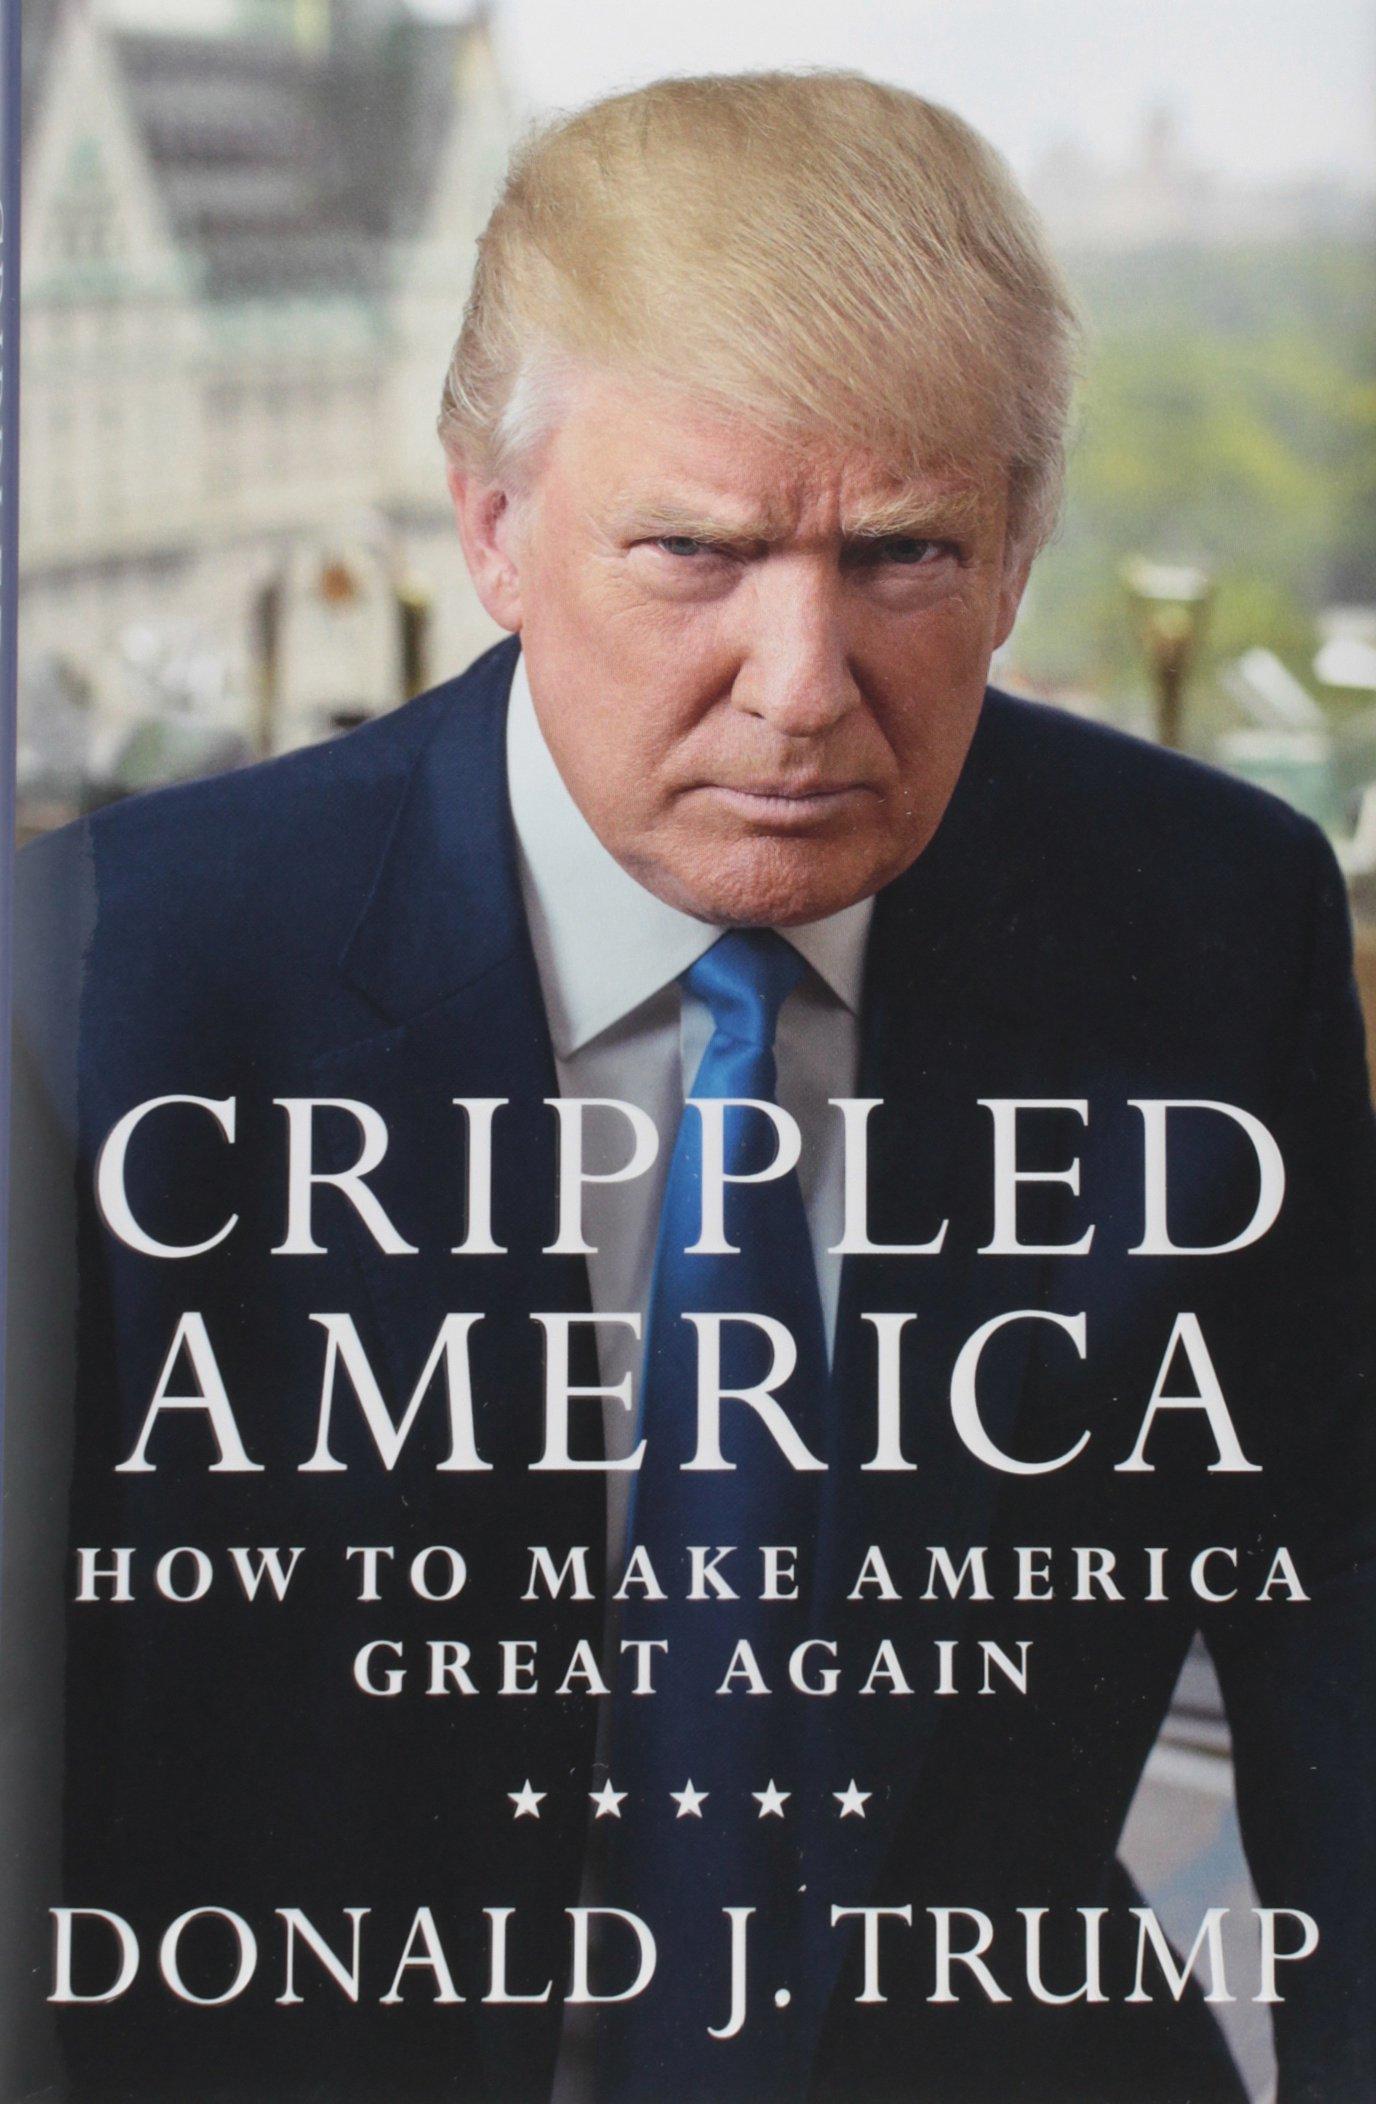 amazon crippled america how to make america great again donald